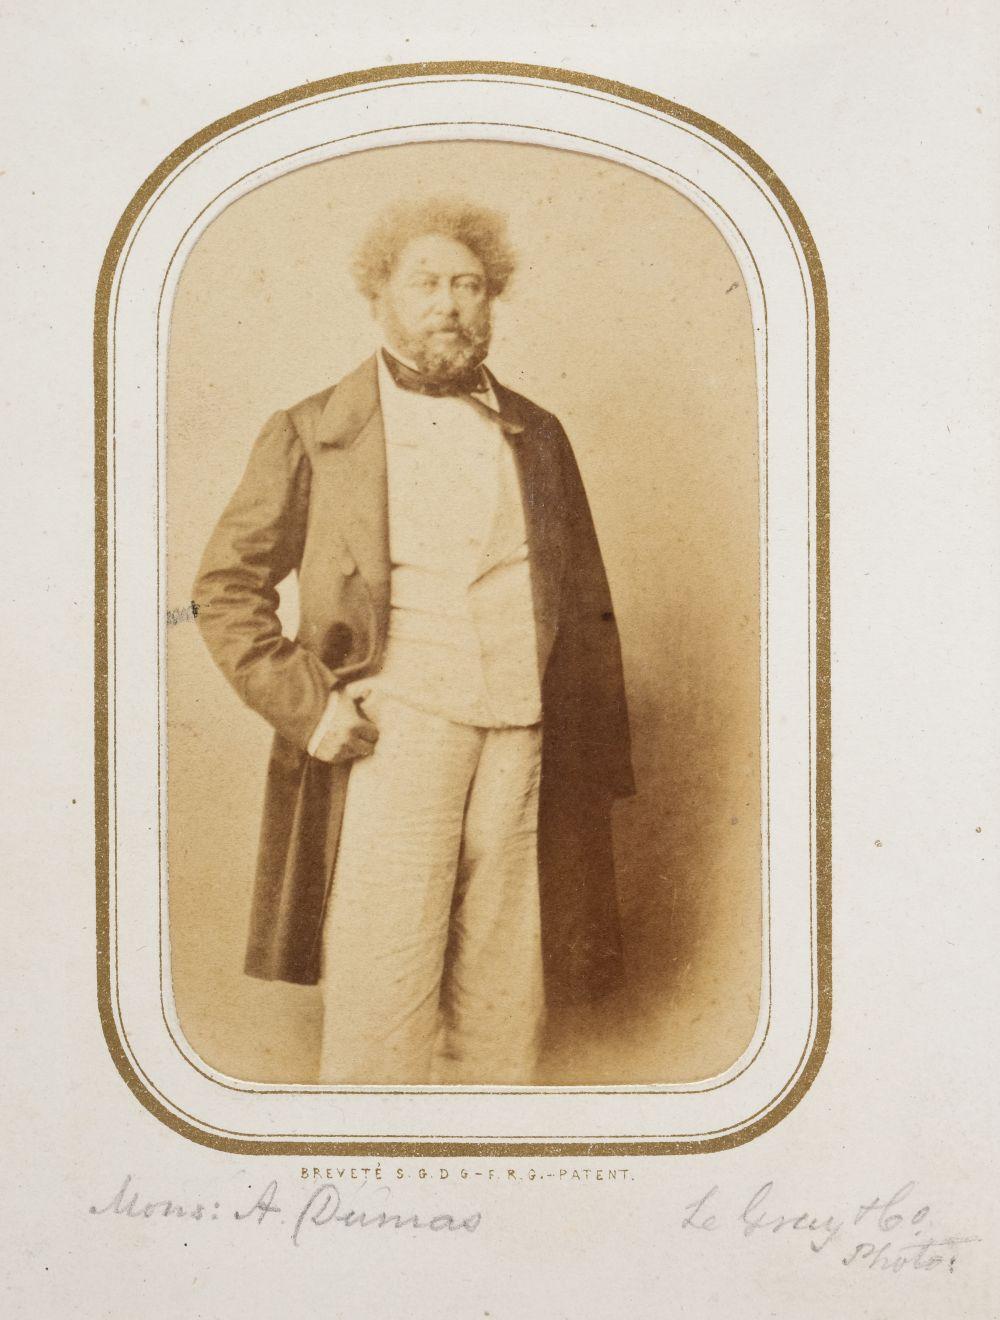 * Cartes de visite. A cartes-de-visite album, c. 1860s/1880s - Image 11 of 18